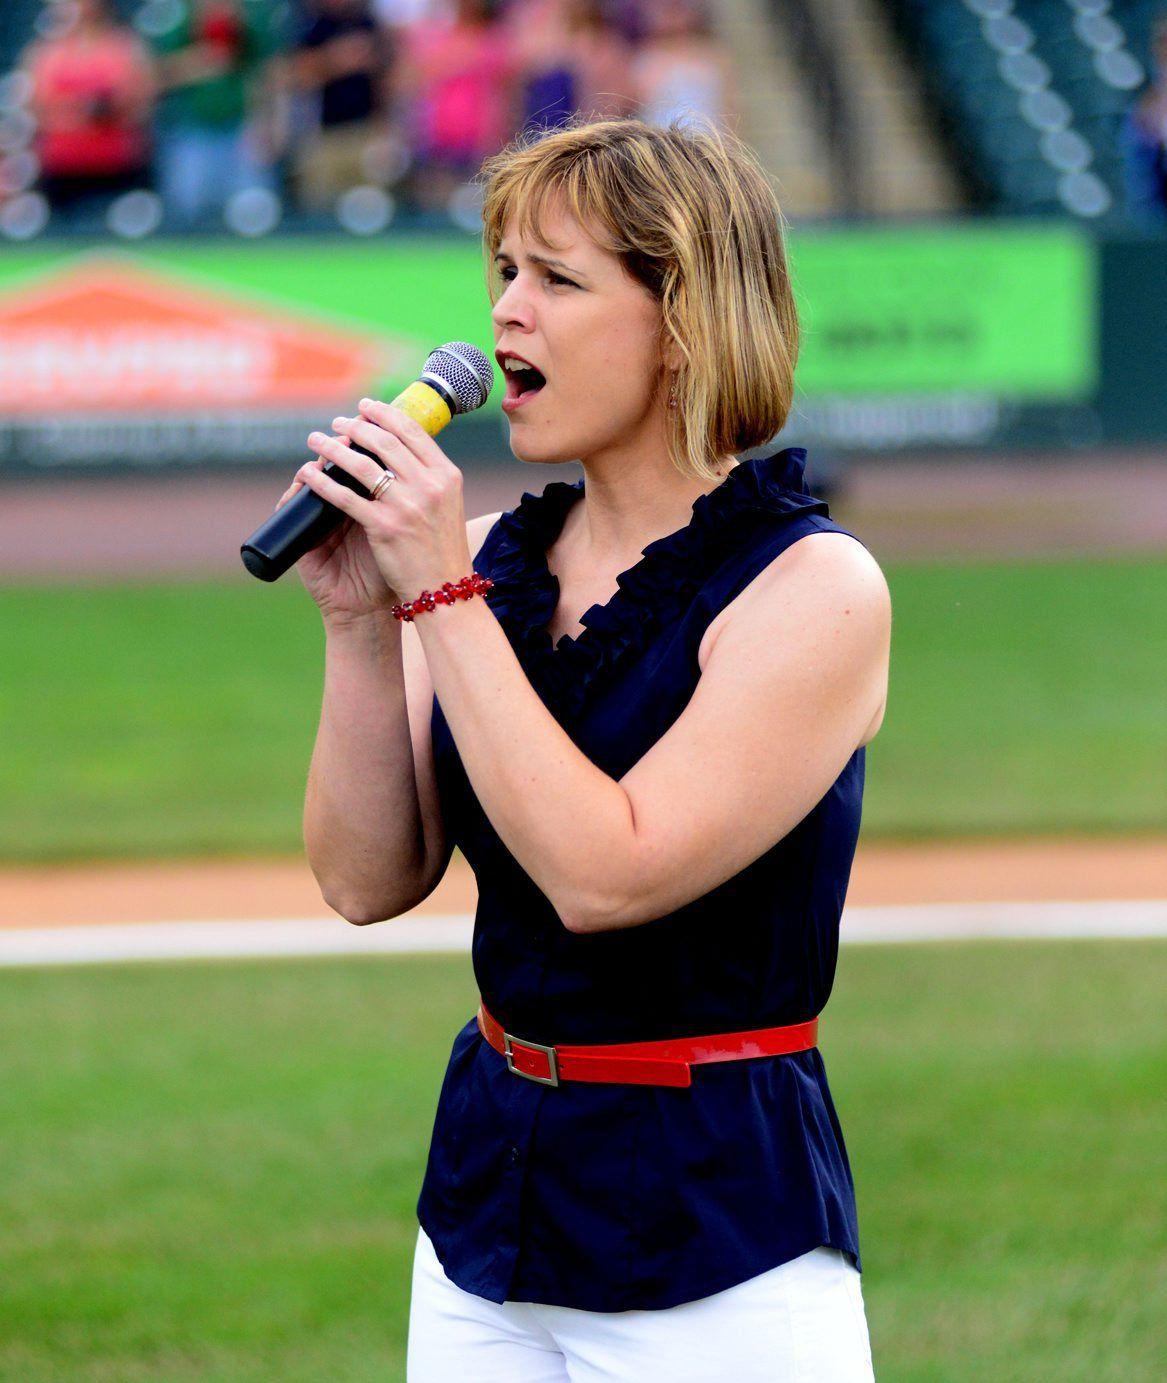 Local woman releases folk Christian album 'All I Need'